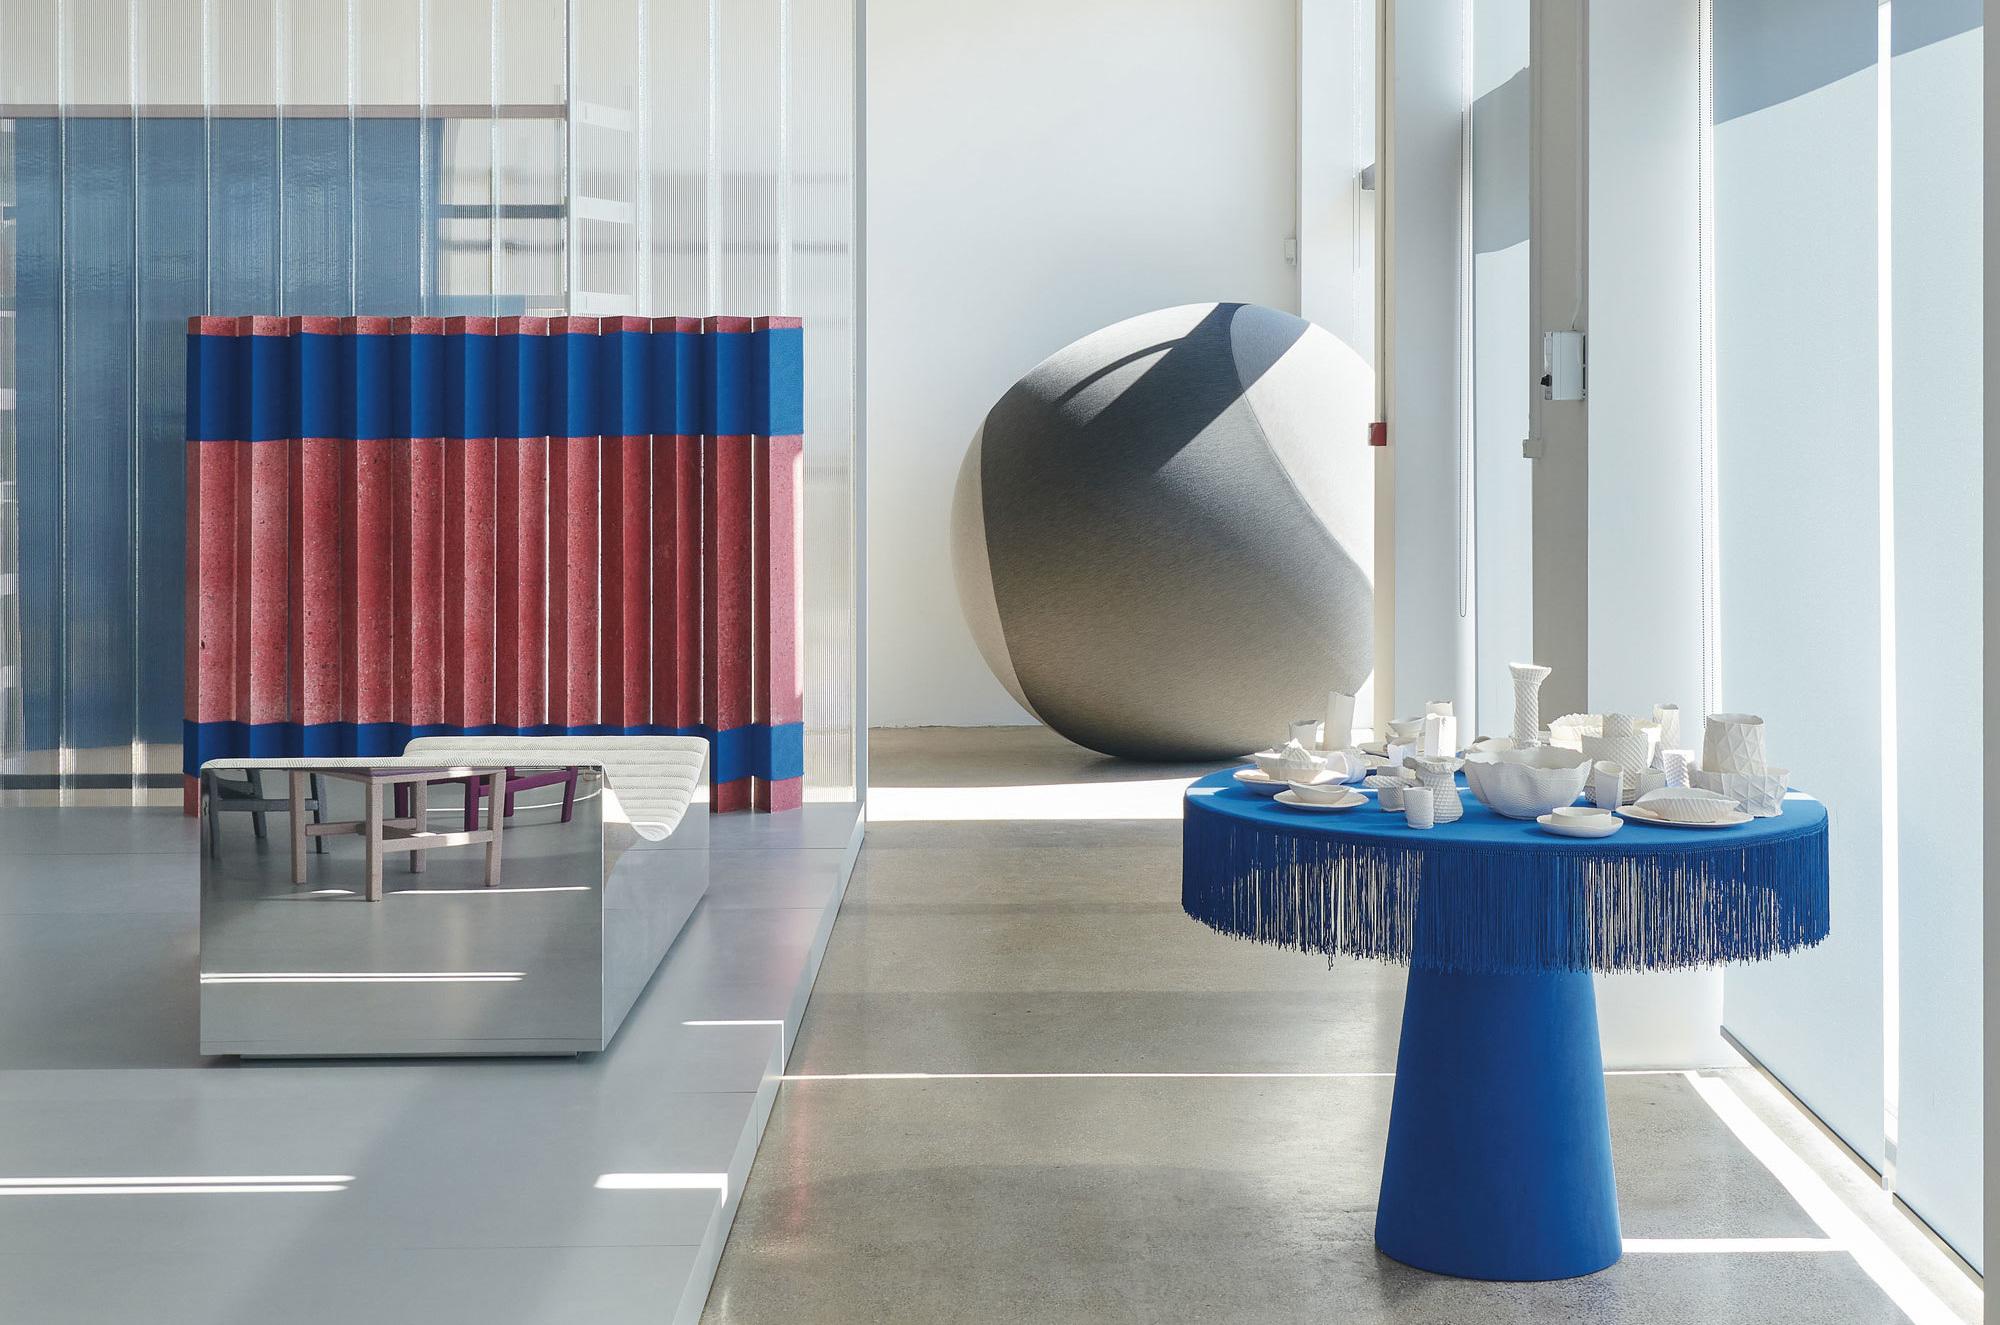 Installation Knit Project im Showroom von Kvadrat in Nordhavn. Foto: Benjamin Lund/ knit.kvadrat.dk